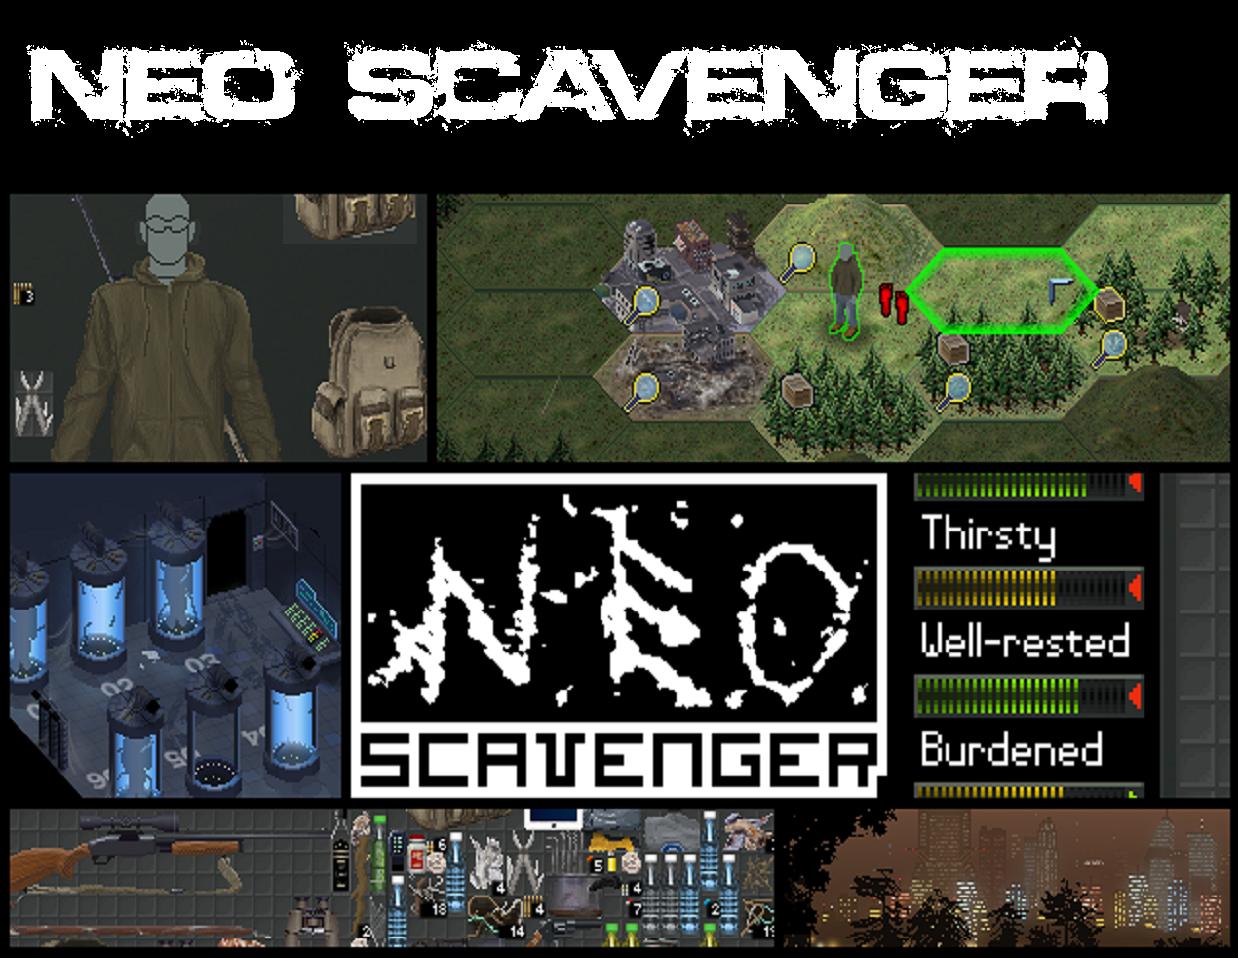 http://radioaktywne-recenzje.blogspot.com/2013/12/recenzja-neo-scavenger.html